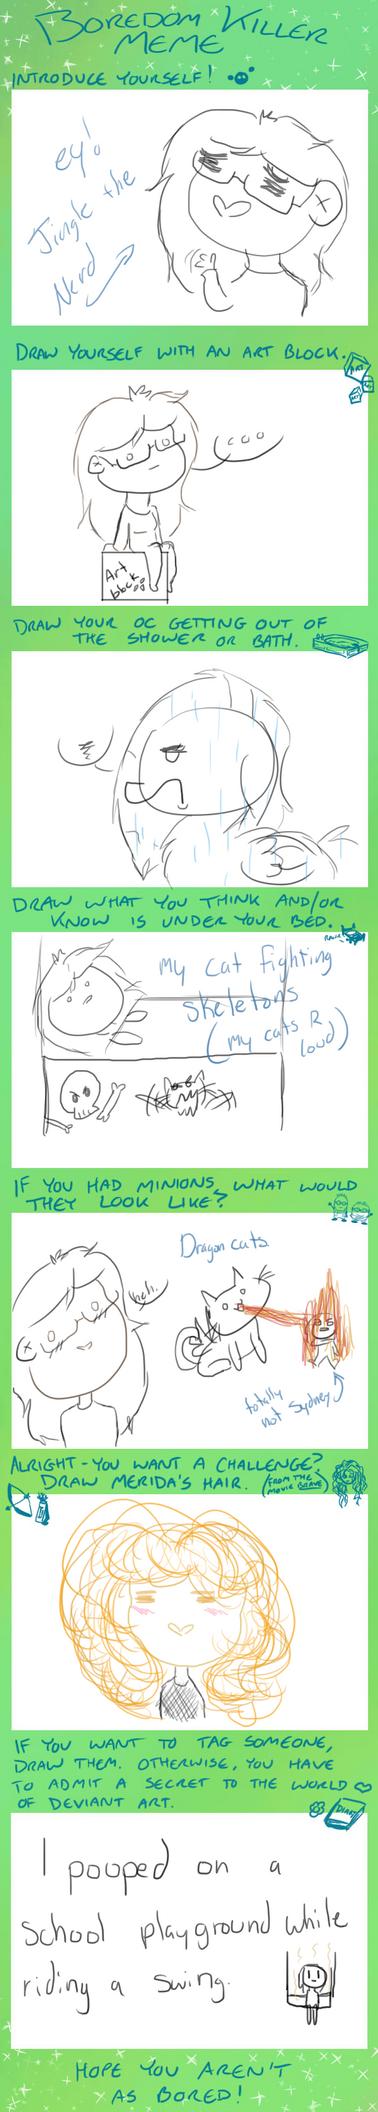 Boredom Meme thing by kittyGLaD